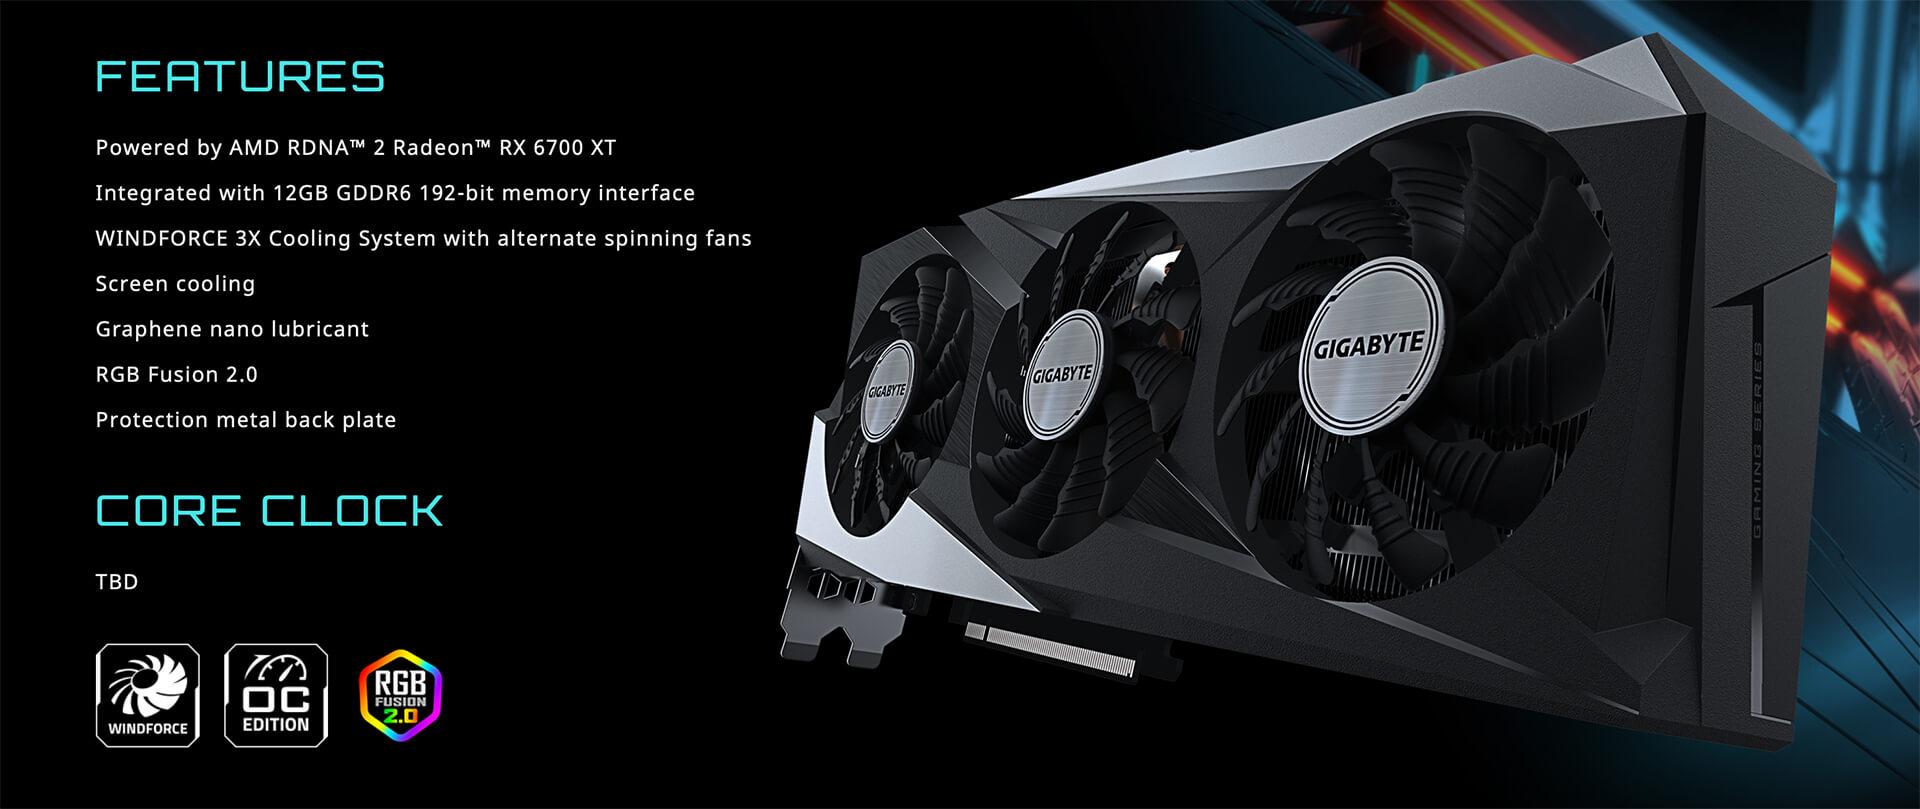 Gigabyte Radeon™ Rx 6700 Xt Gaming Oc 12g 12gb Gddr6